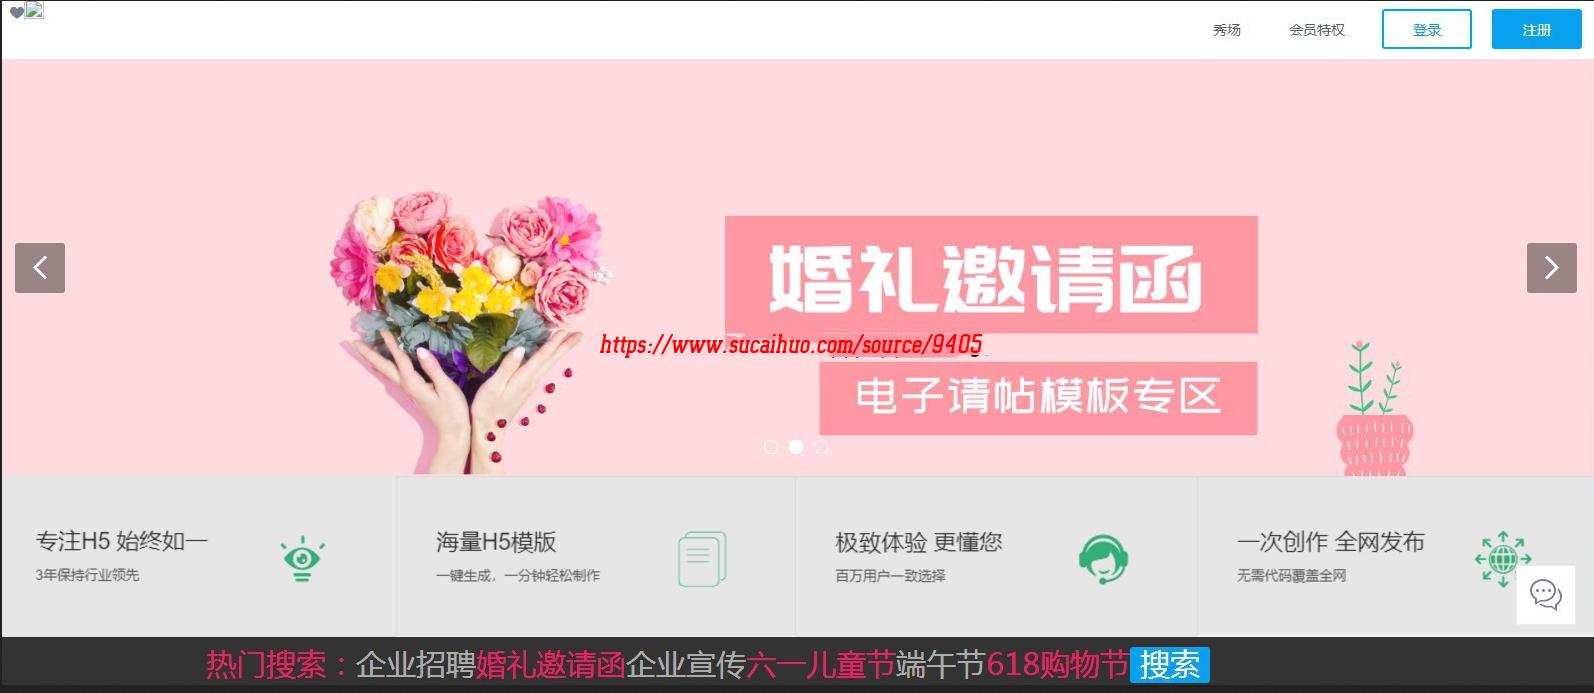 PHP微场景v15.8HTML5婚礼邀请函电子请帖模板门户网站源码整站源码